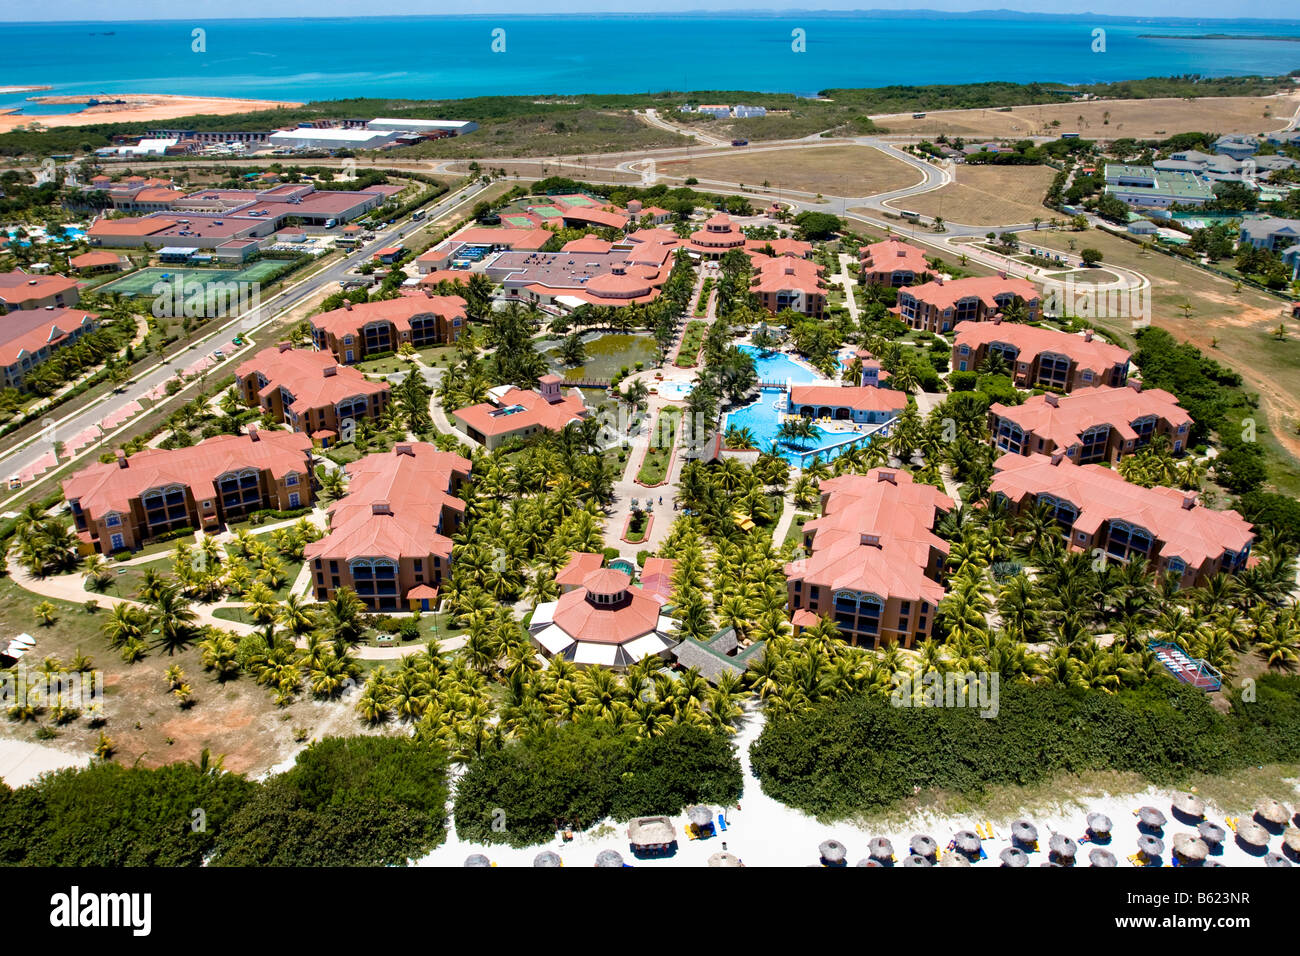 Luxury hotels on varadero cuba caribbean central america america